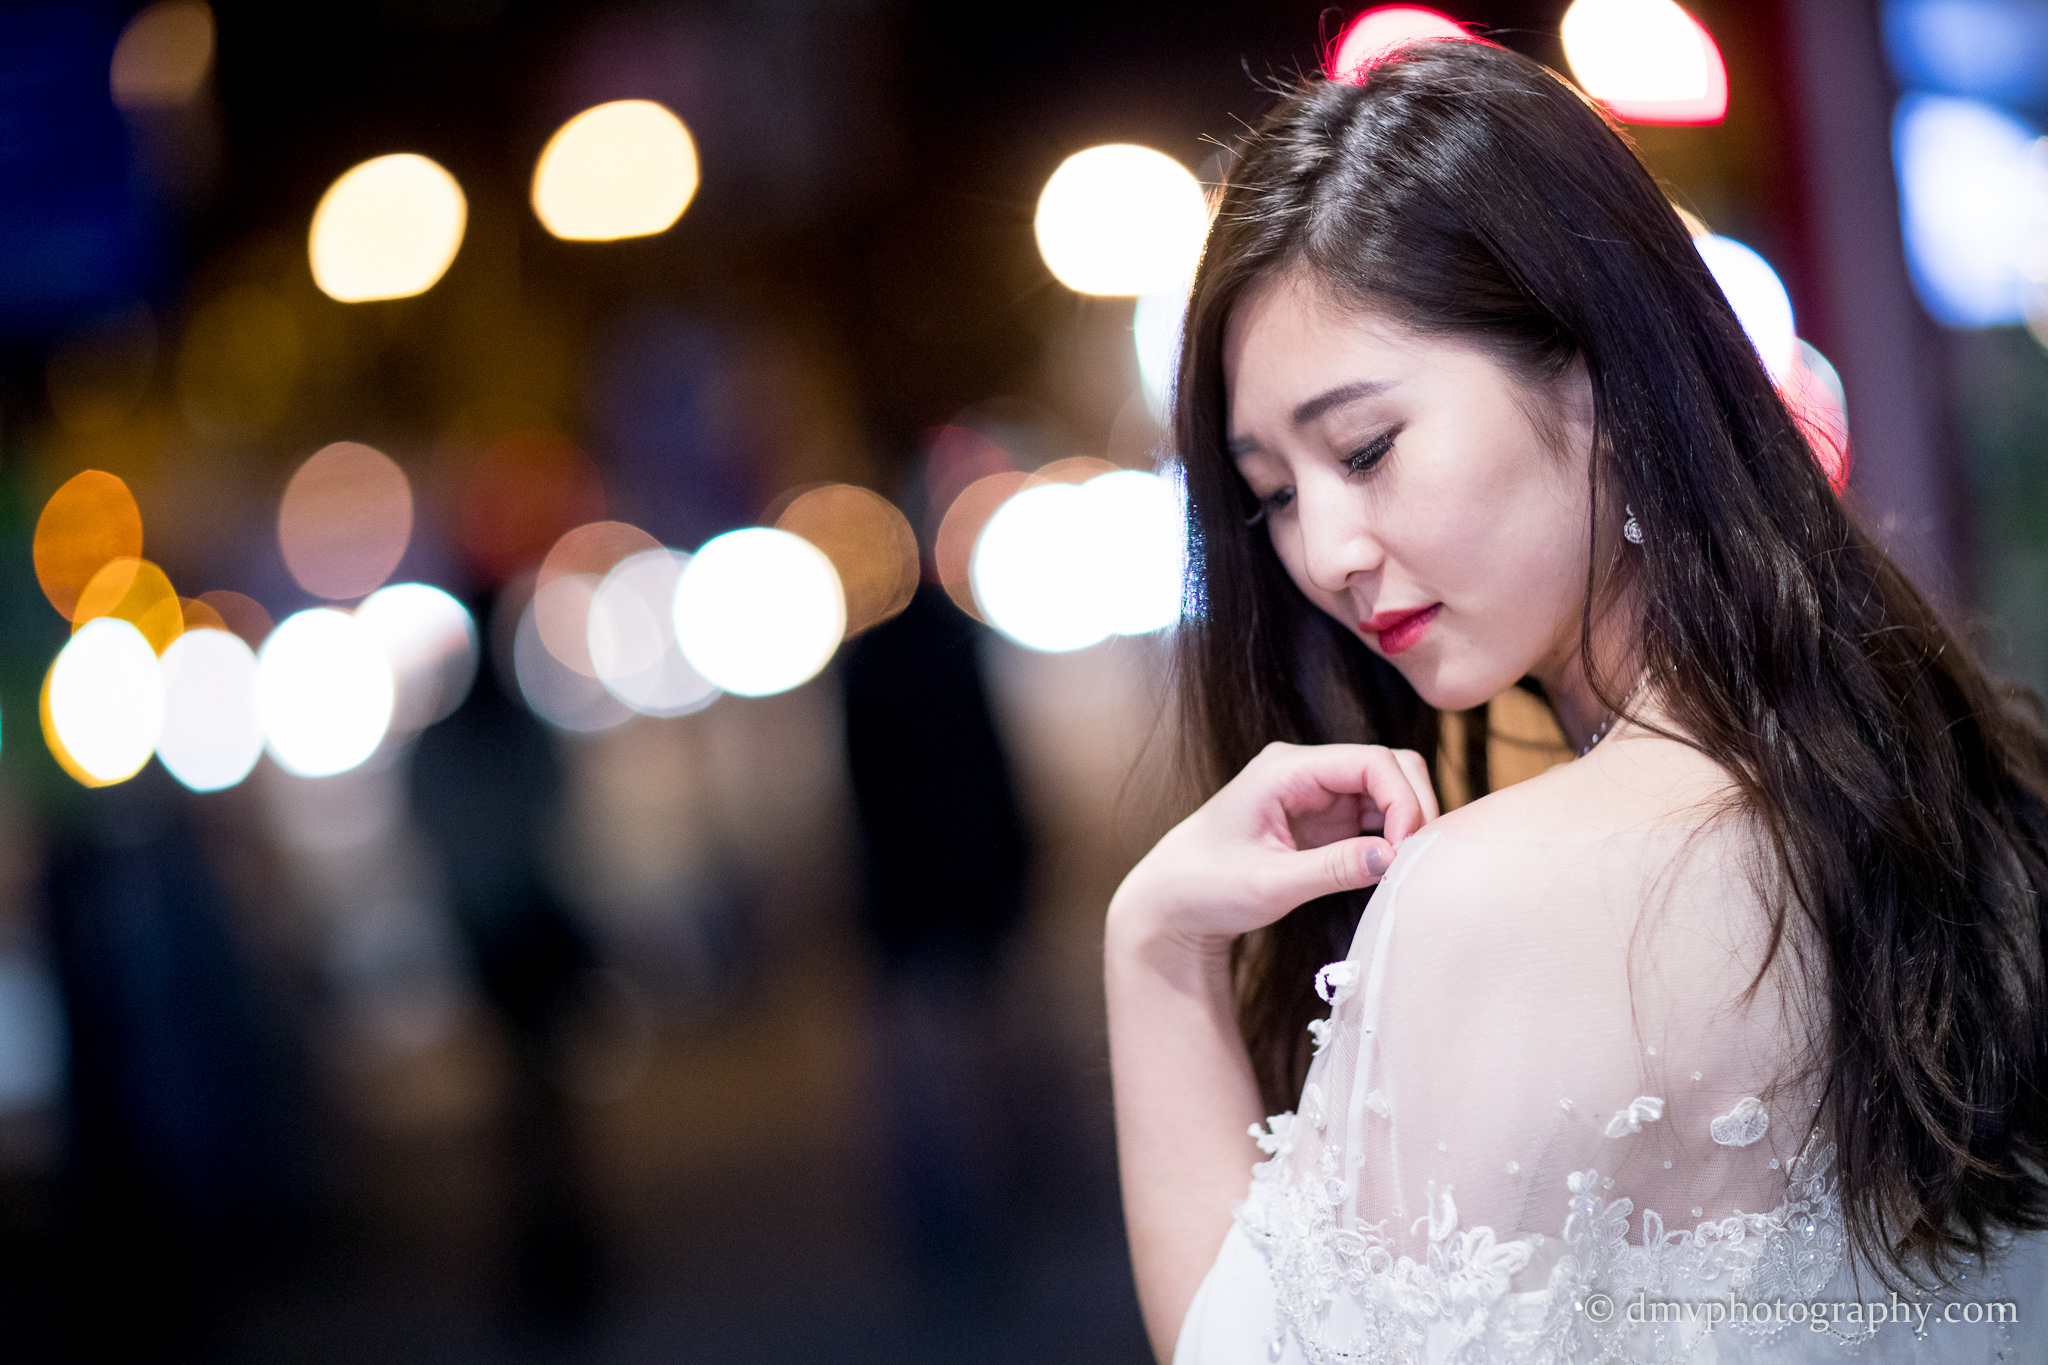 2016-10-15 - Story Chen - 00134